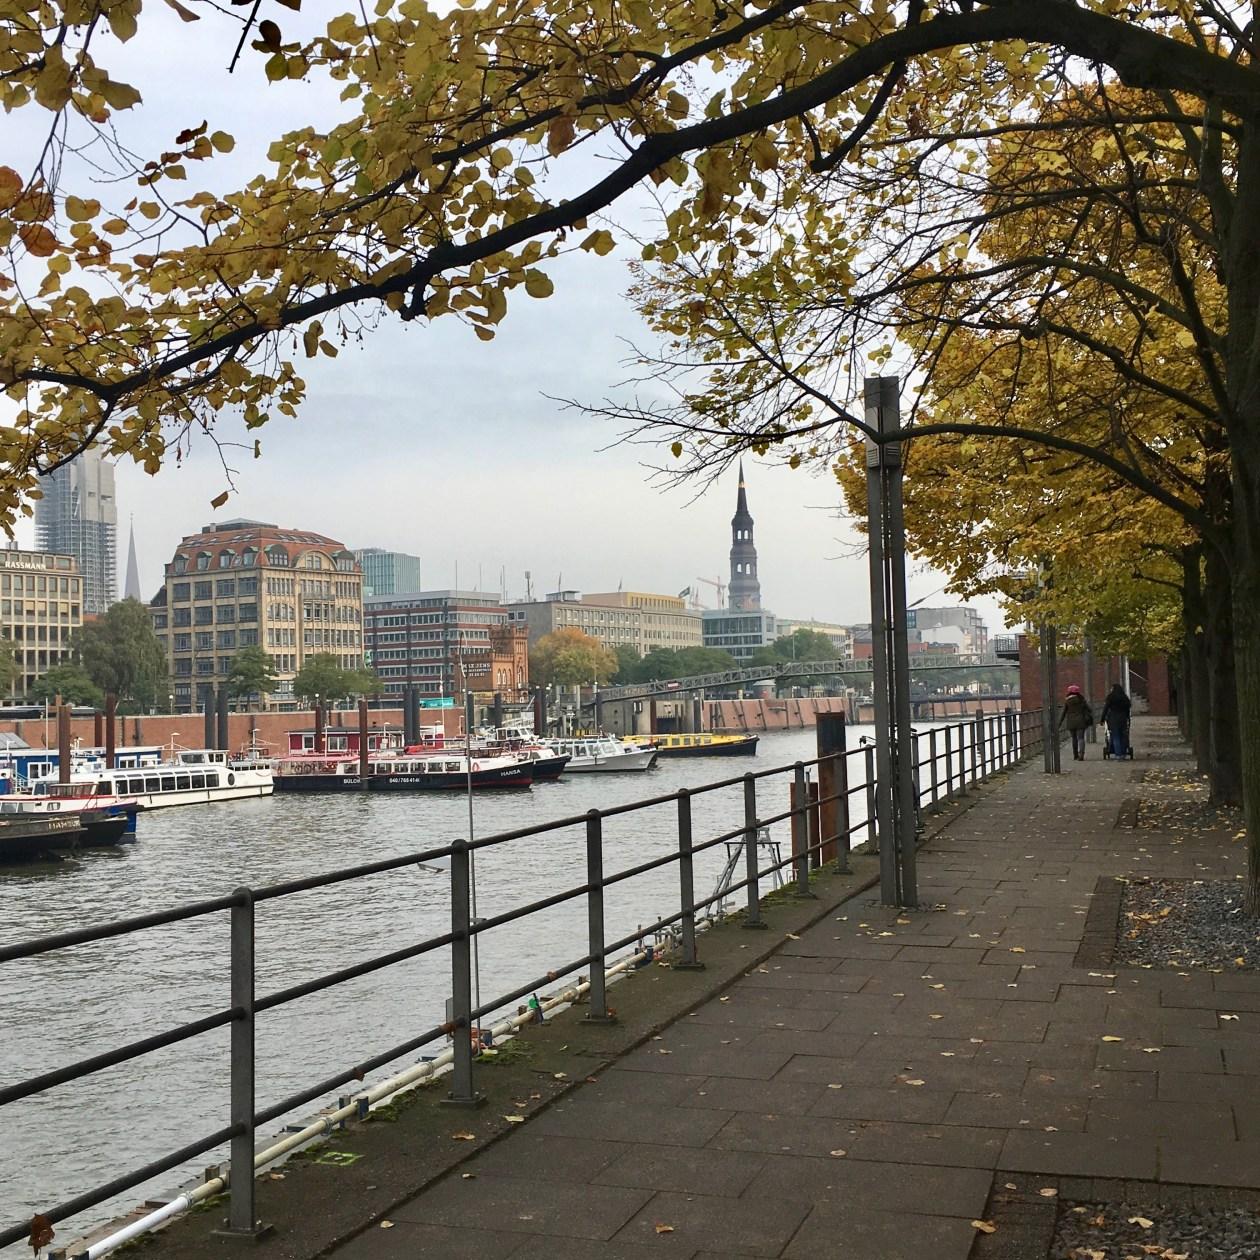 Hamburg Germany after work